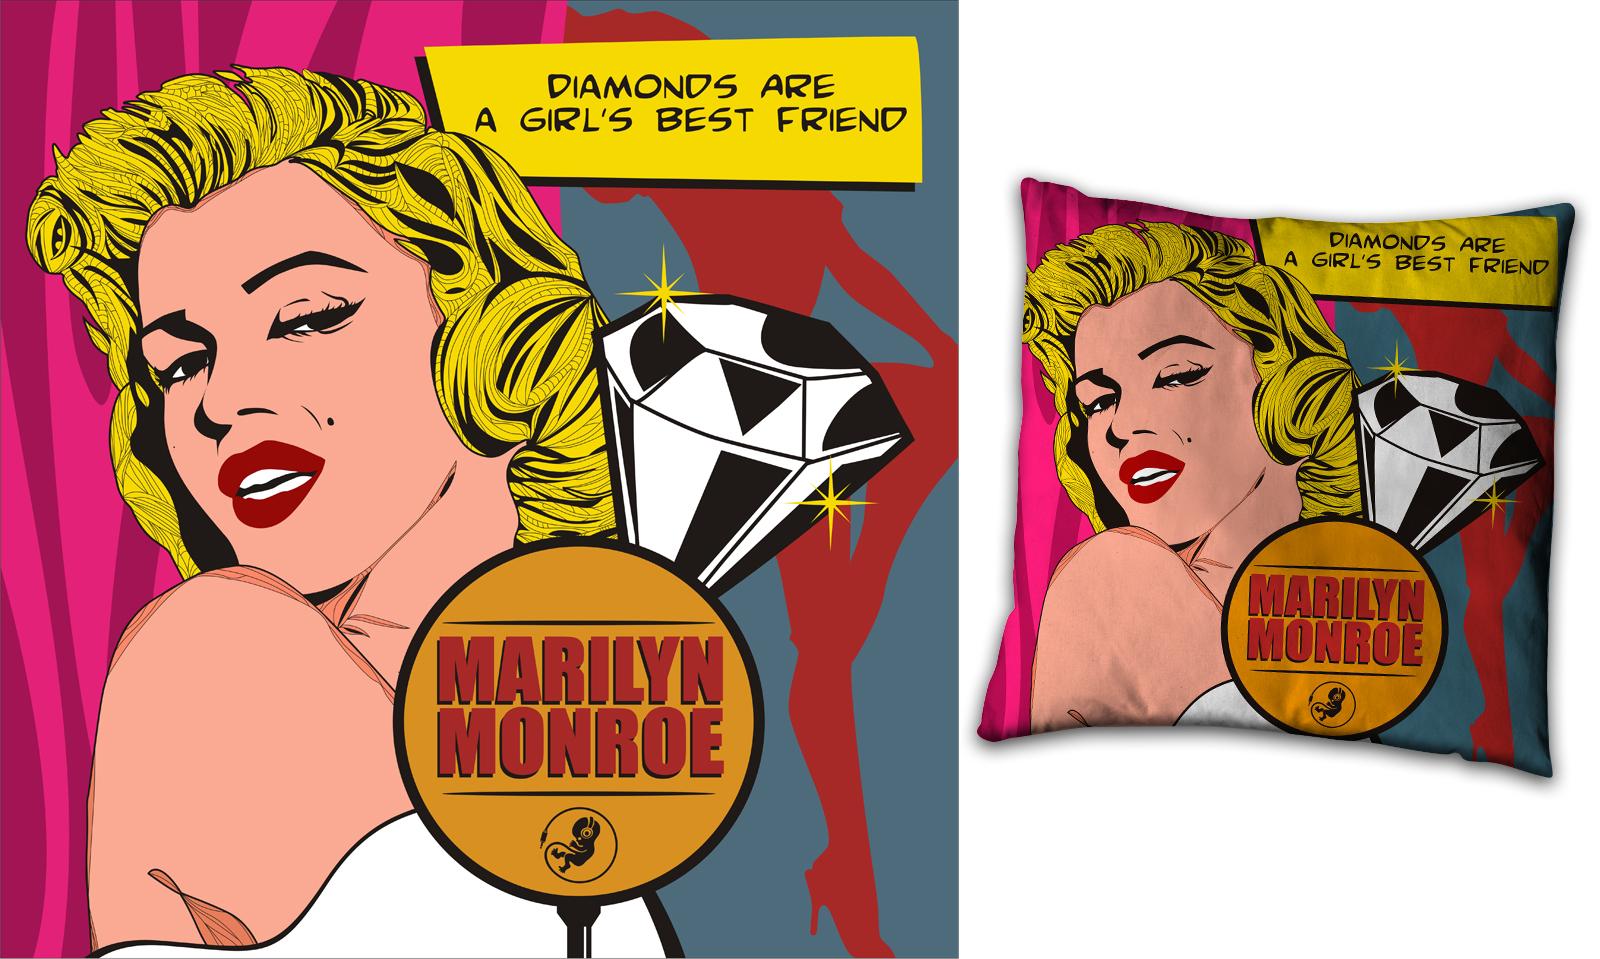 http://3.bp.blogspot.com/-HaoPc9pgkWE/TgsSJ1pGtpI/AAAAAAAAASA/DRTjRqLL1Pk/s1600/Marilyn%2BMonroe.jpg